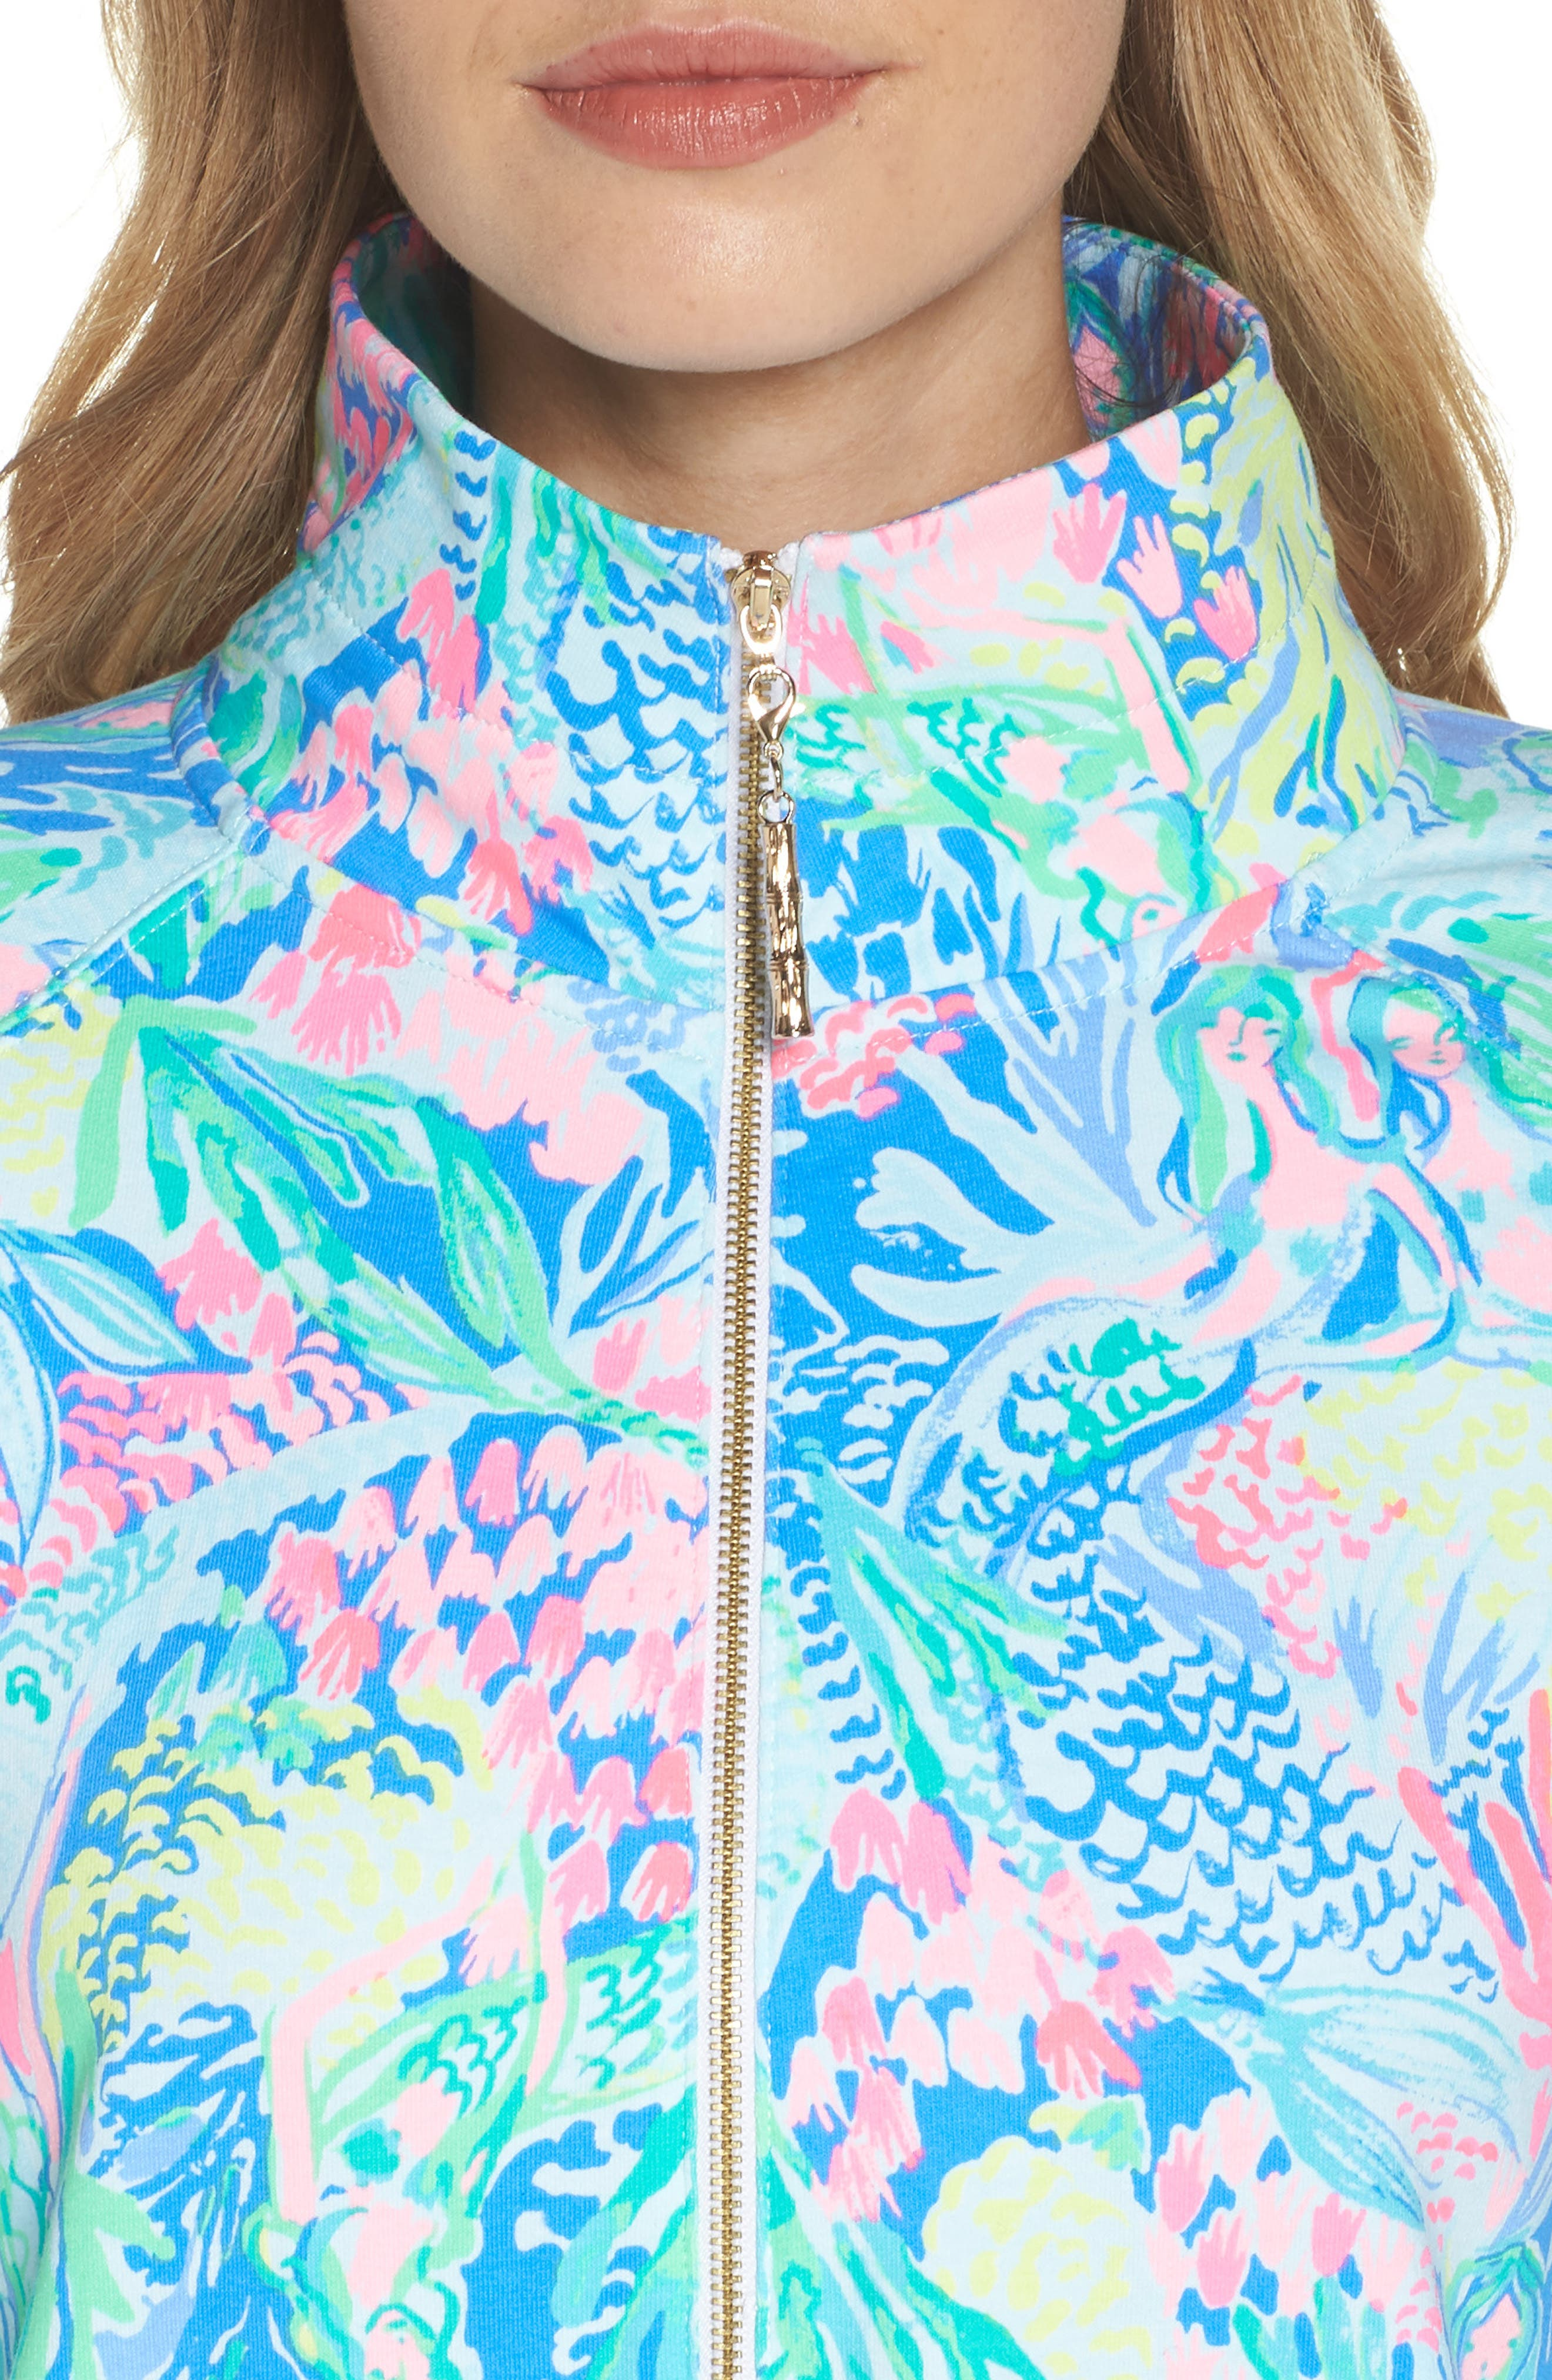 Lilly Pulitzer Skipper Shift Dress,                             Alternate thumbnail 4, color,                             Multi Mermaids Cove